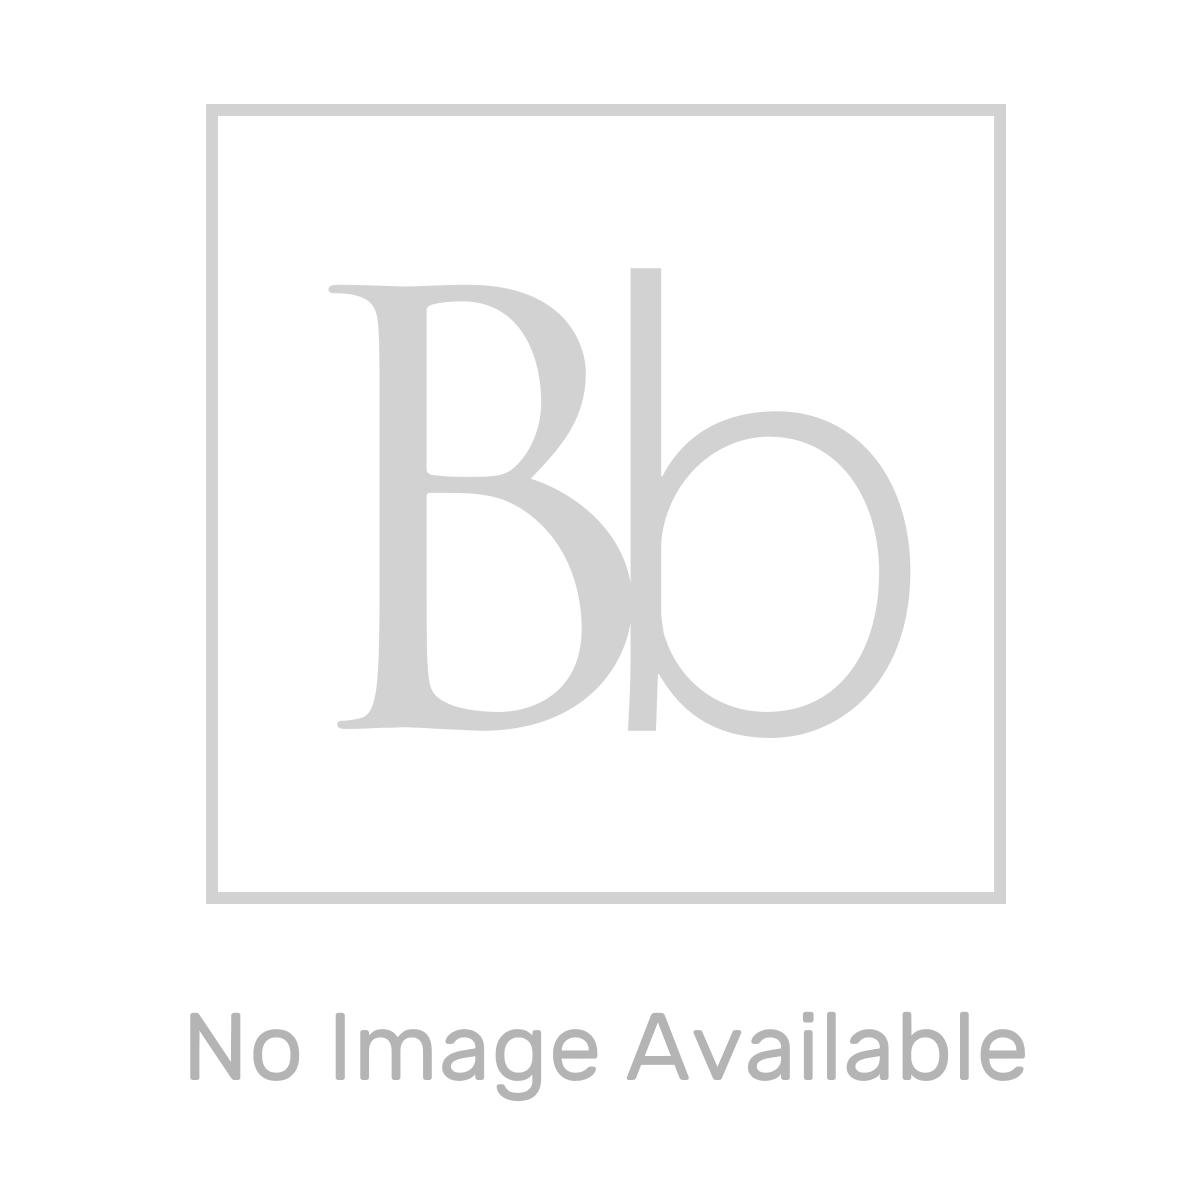 Aquadart Rectangular 1400 x 800 Shower Tray